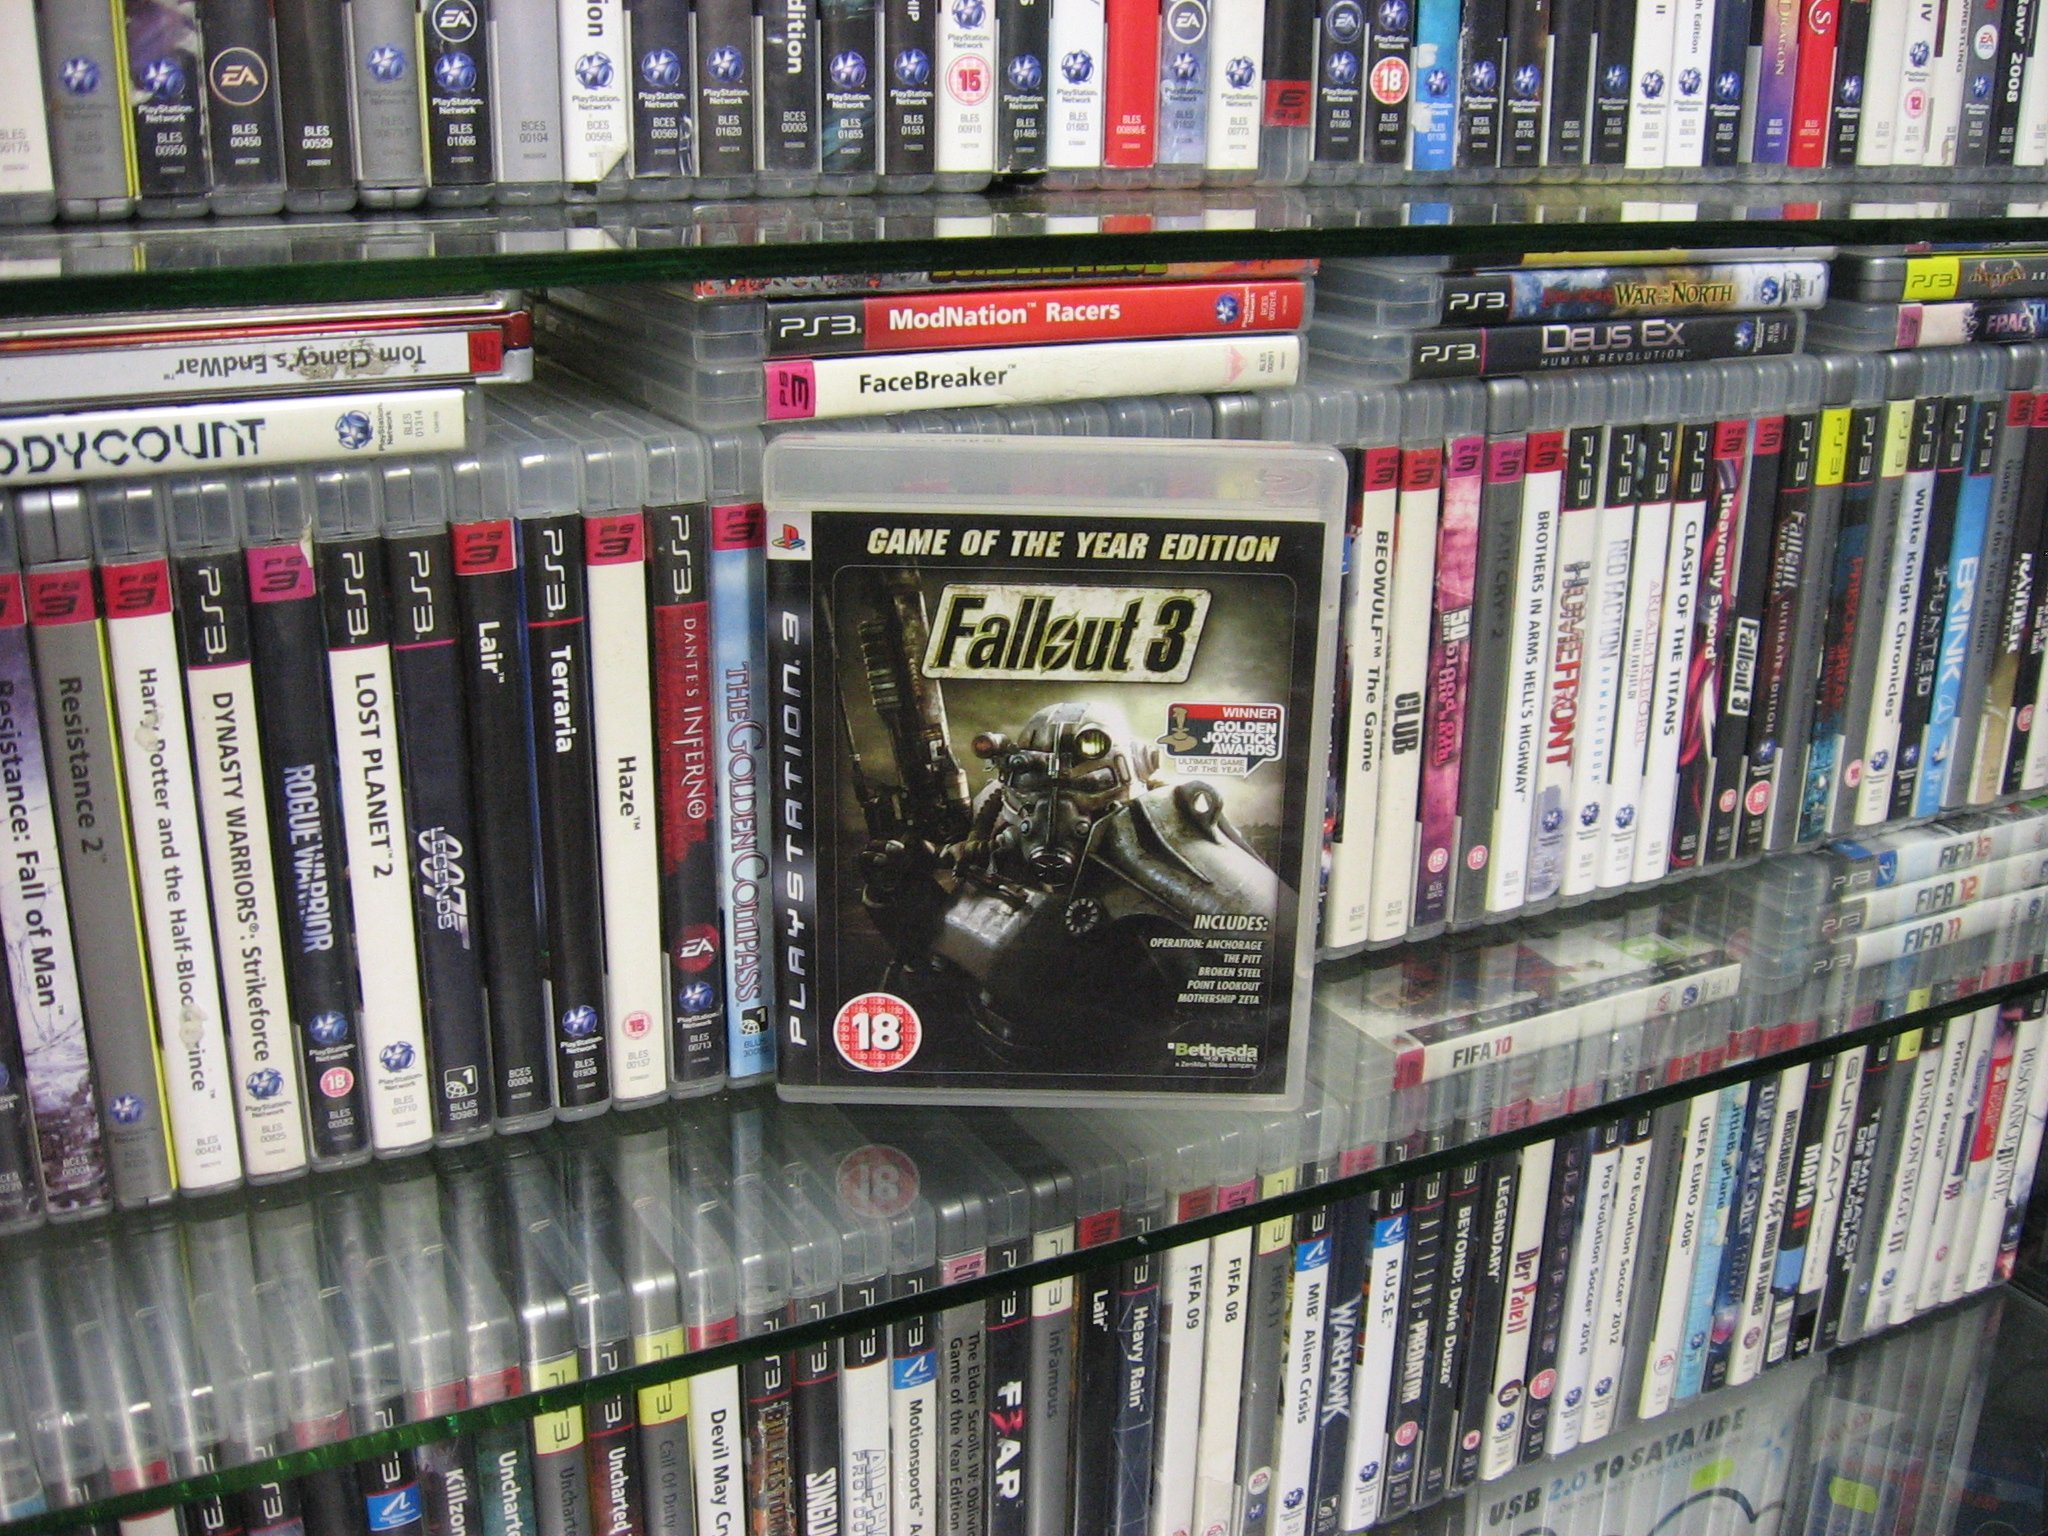 Fallout 3 - GRA PS3 Opole 0051